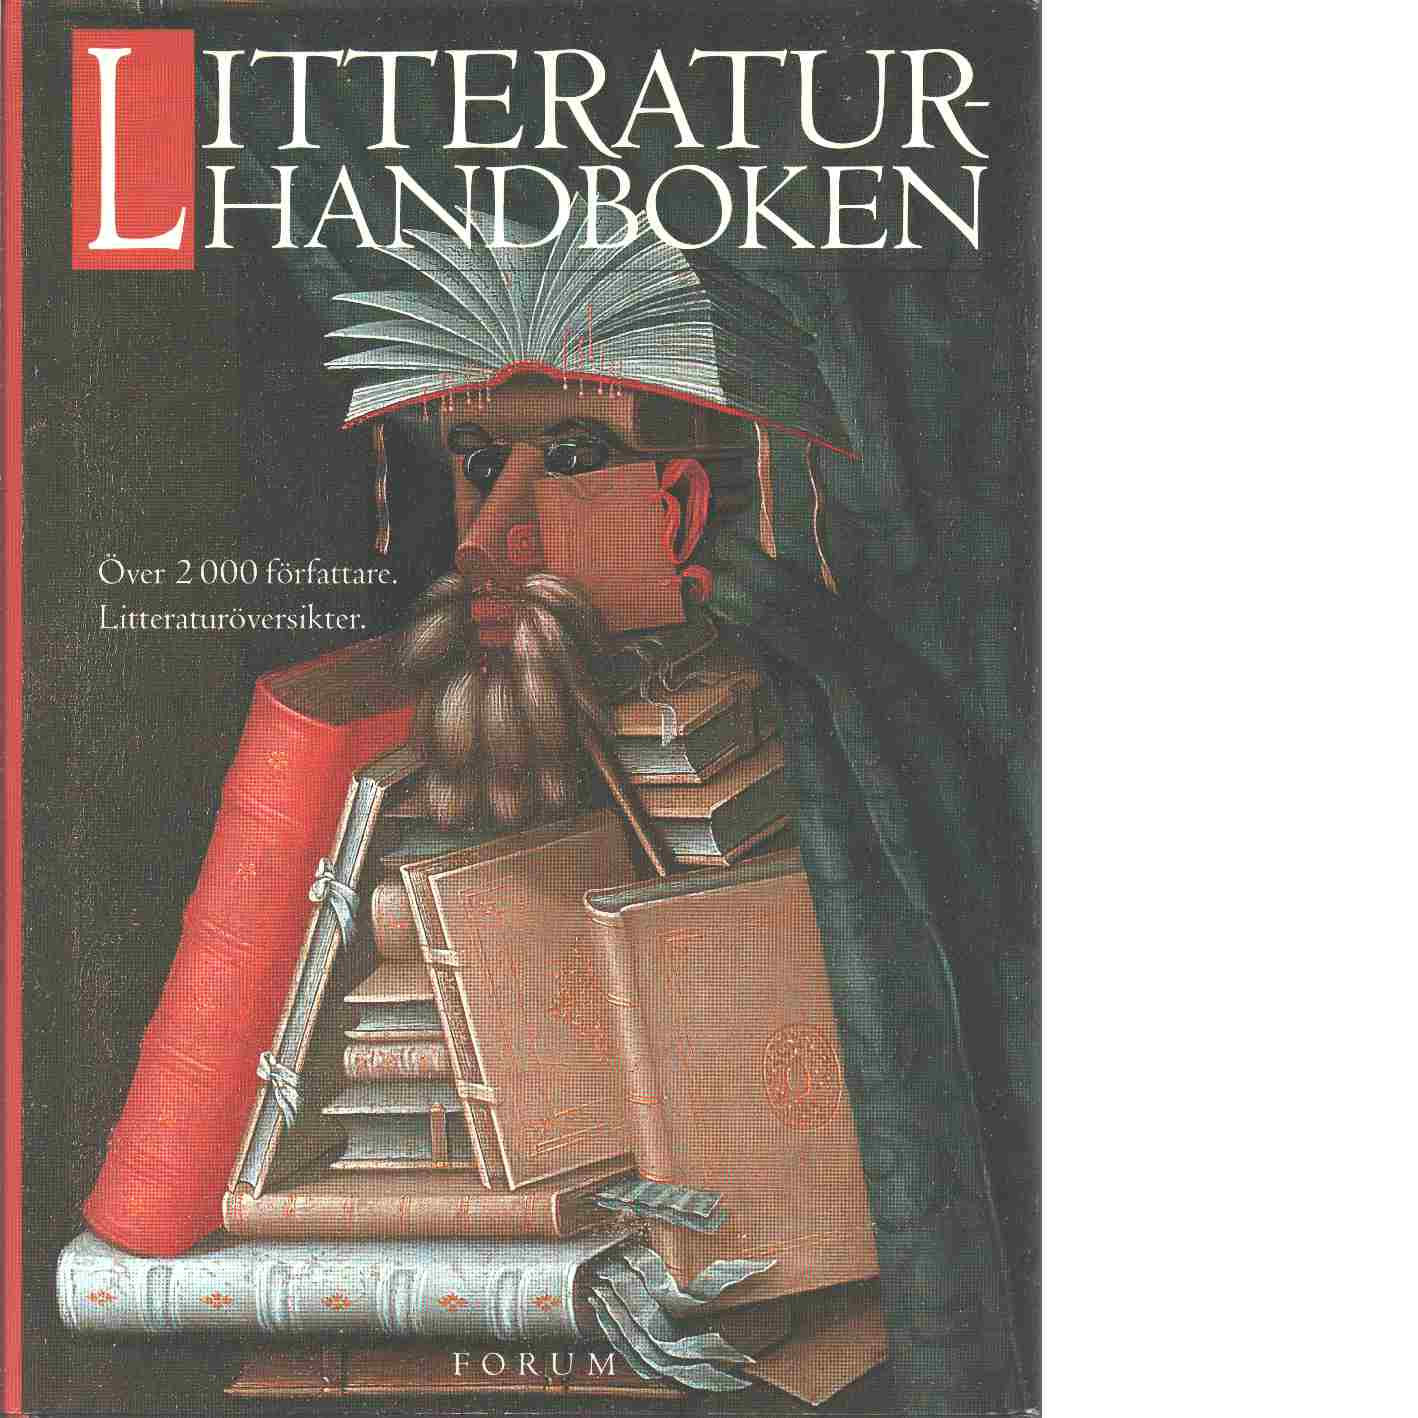 Litteraturhandboken - Linnell, Björn